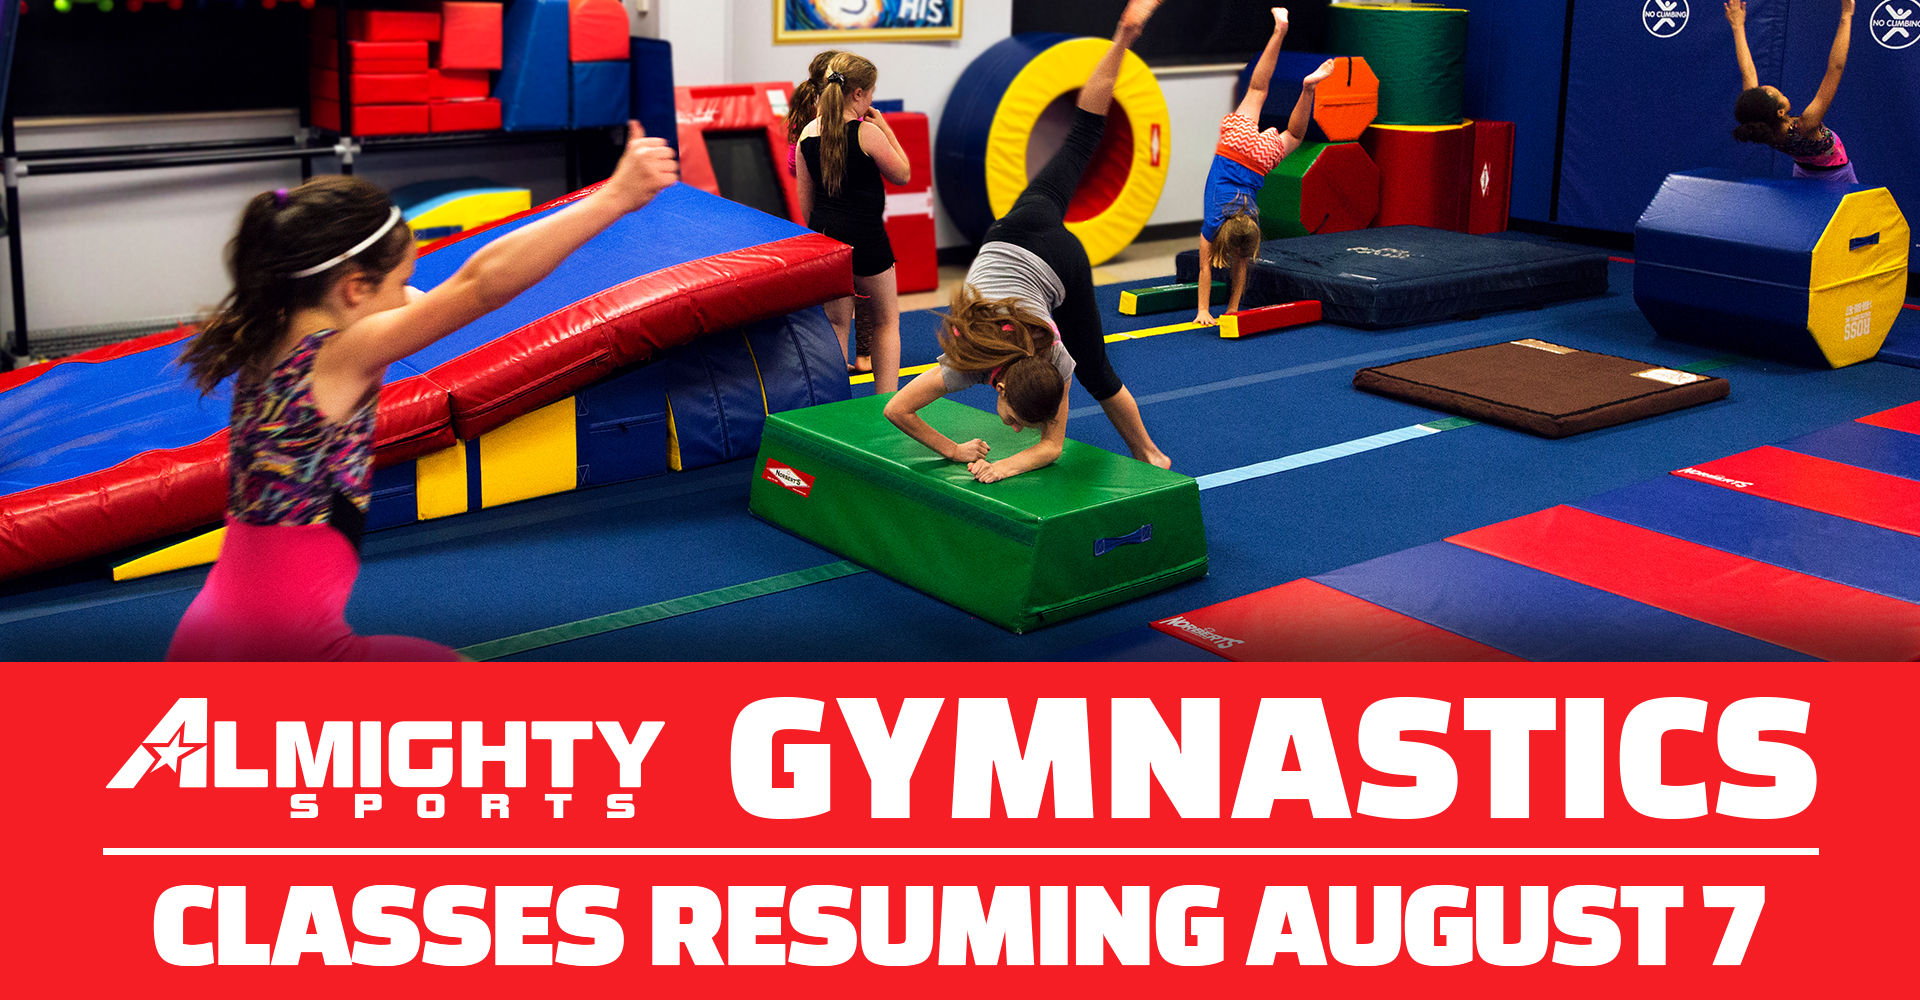 Slider Image: Gymnastics